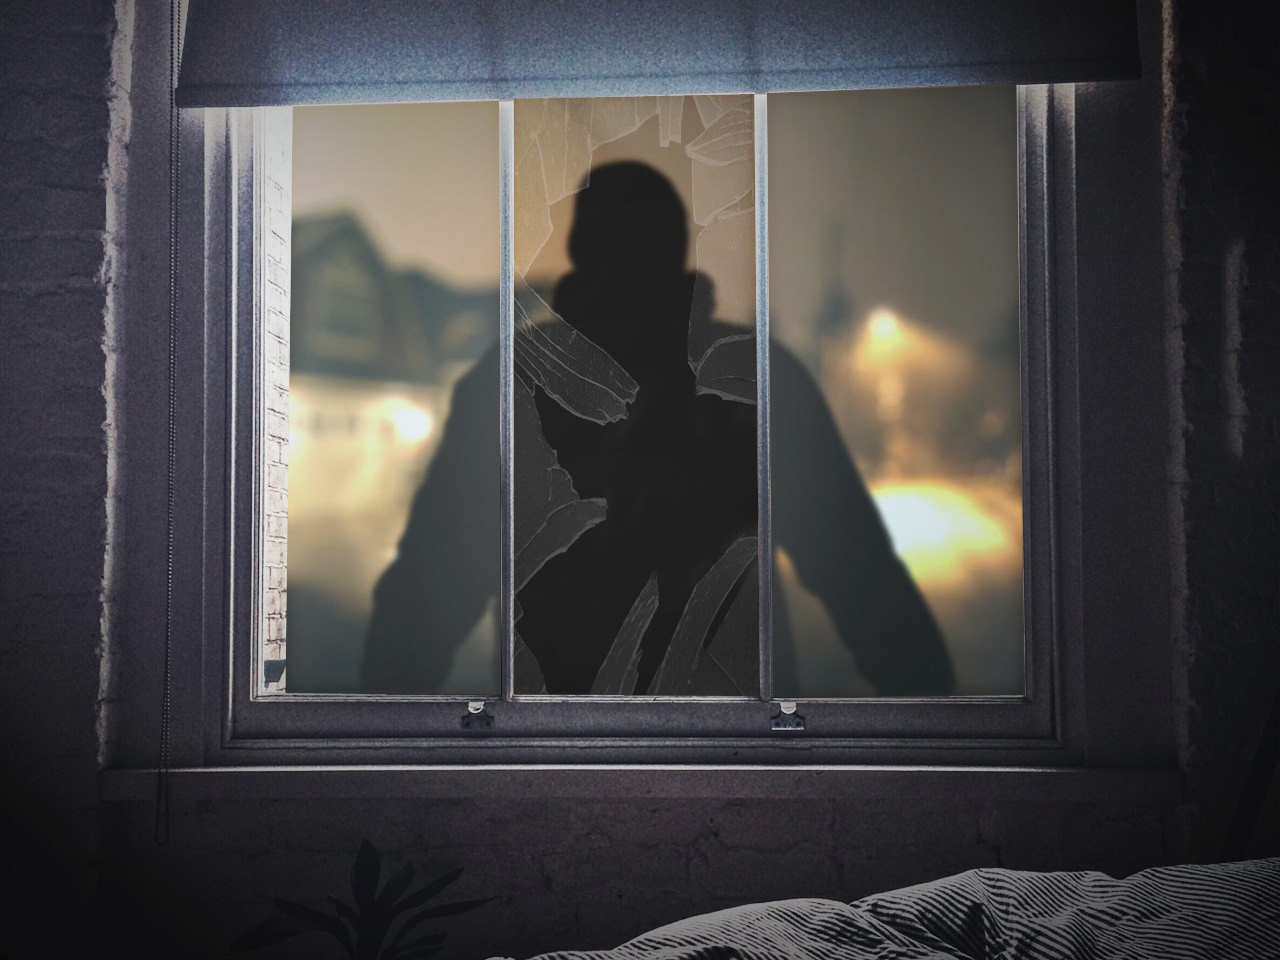 robbery home invasion_1544707410348.jpg.jpg